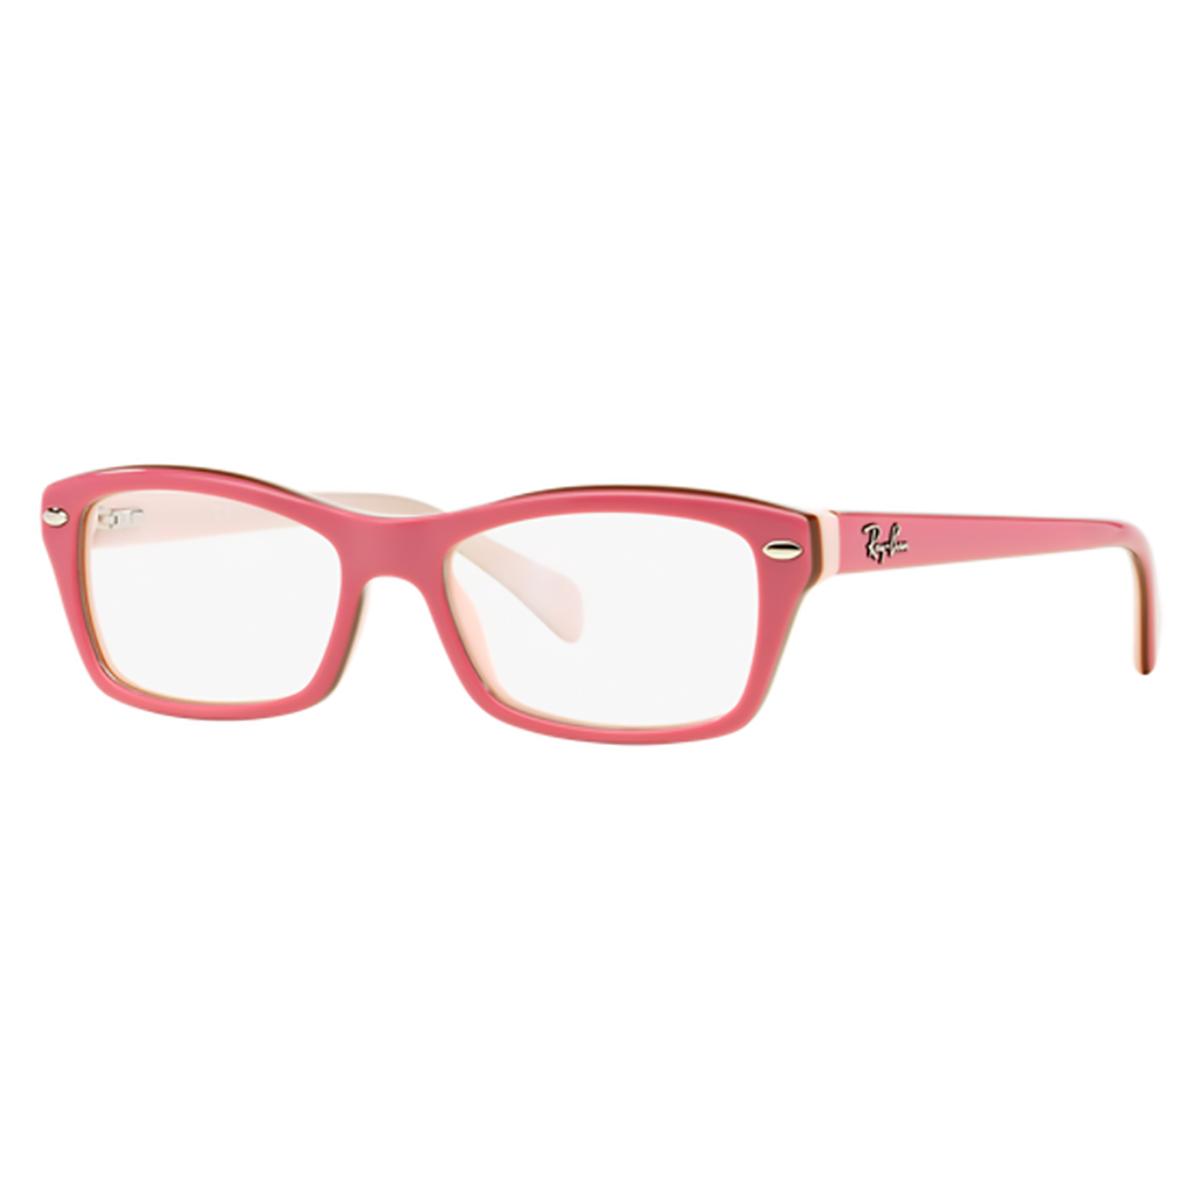 411c0ac512dbe óculos Ray Ban De Grau Infantil   Cepar